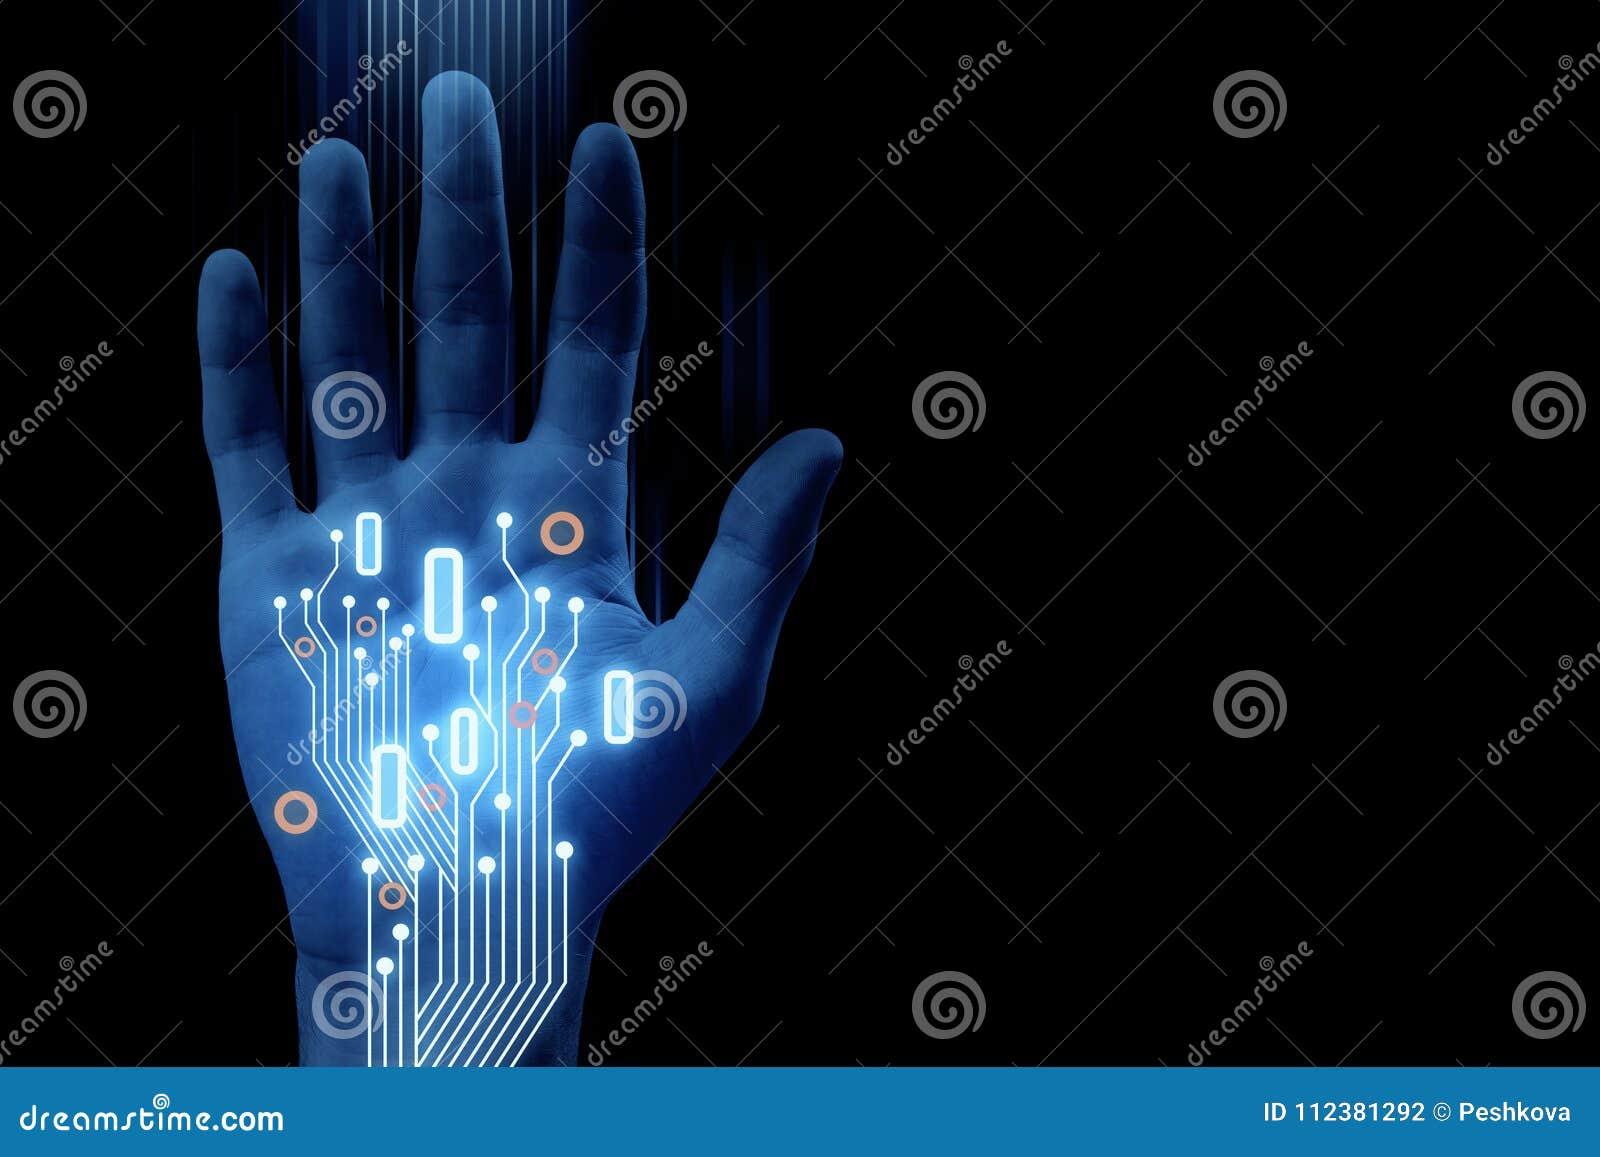 Robotics And Cyberspace Background Stock Illustration Illustration